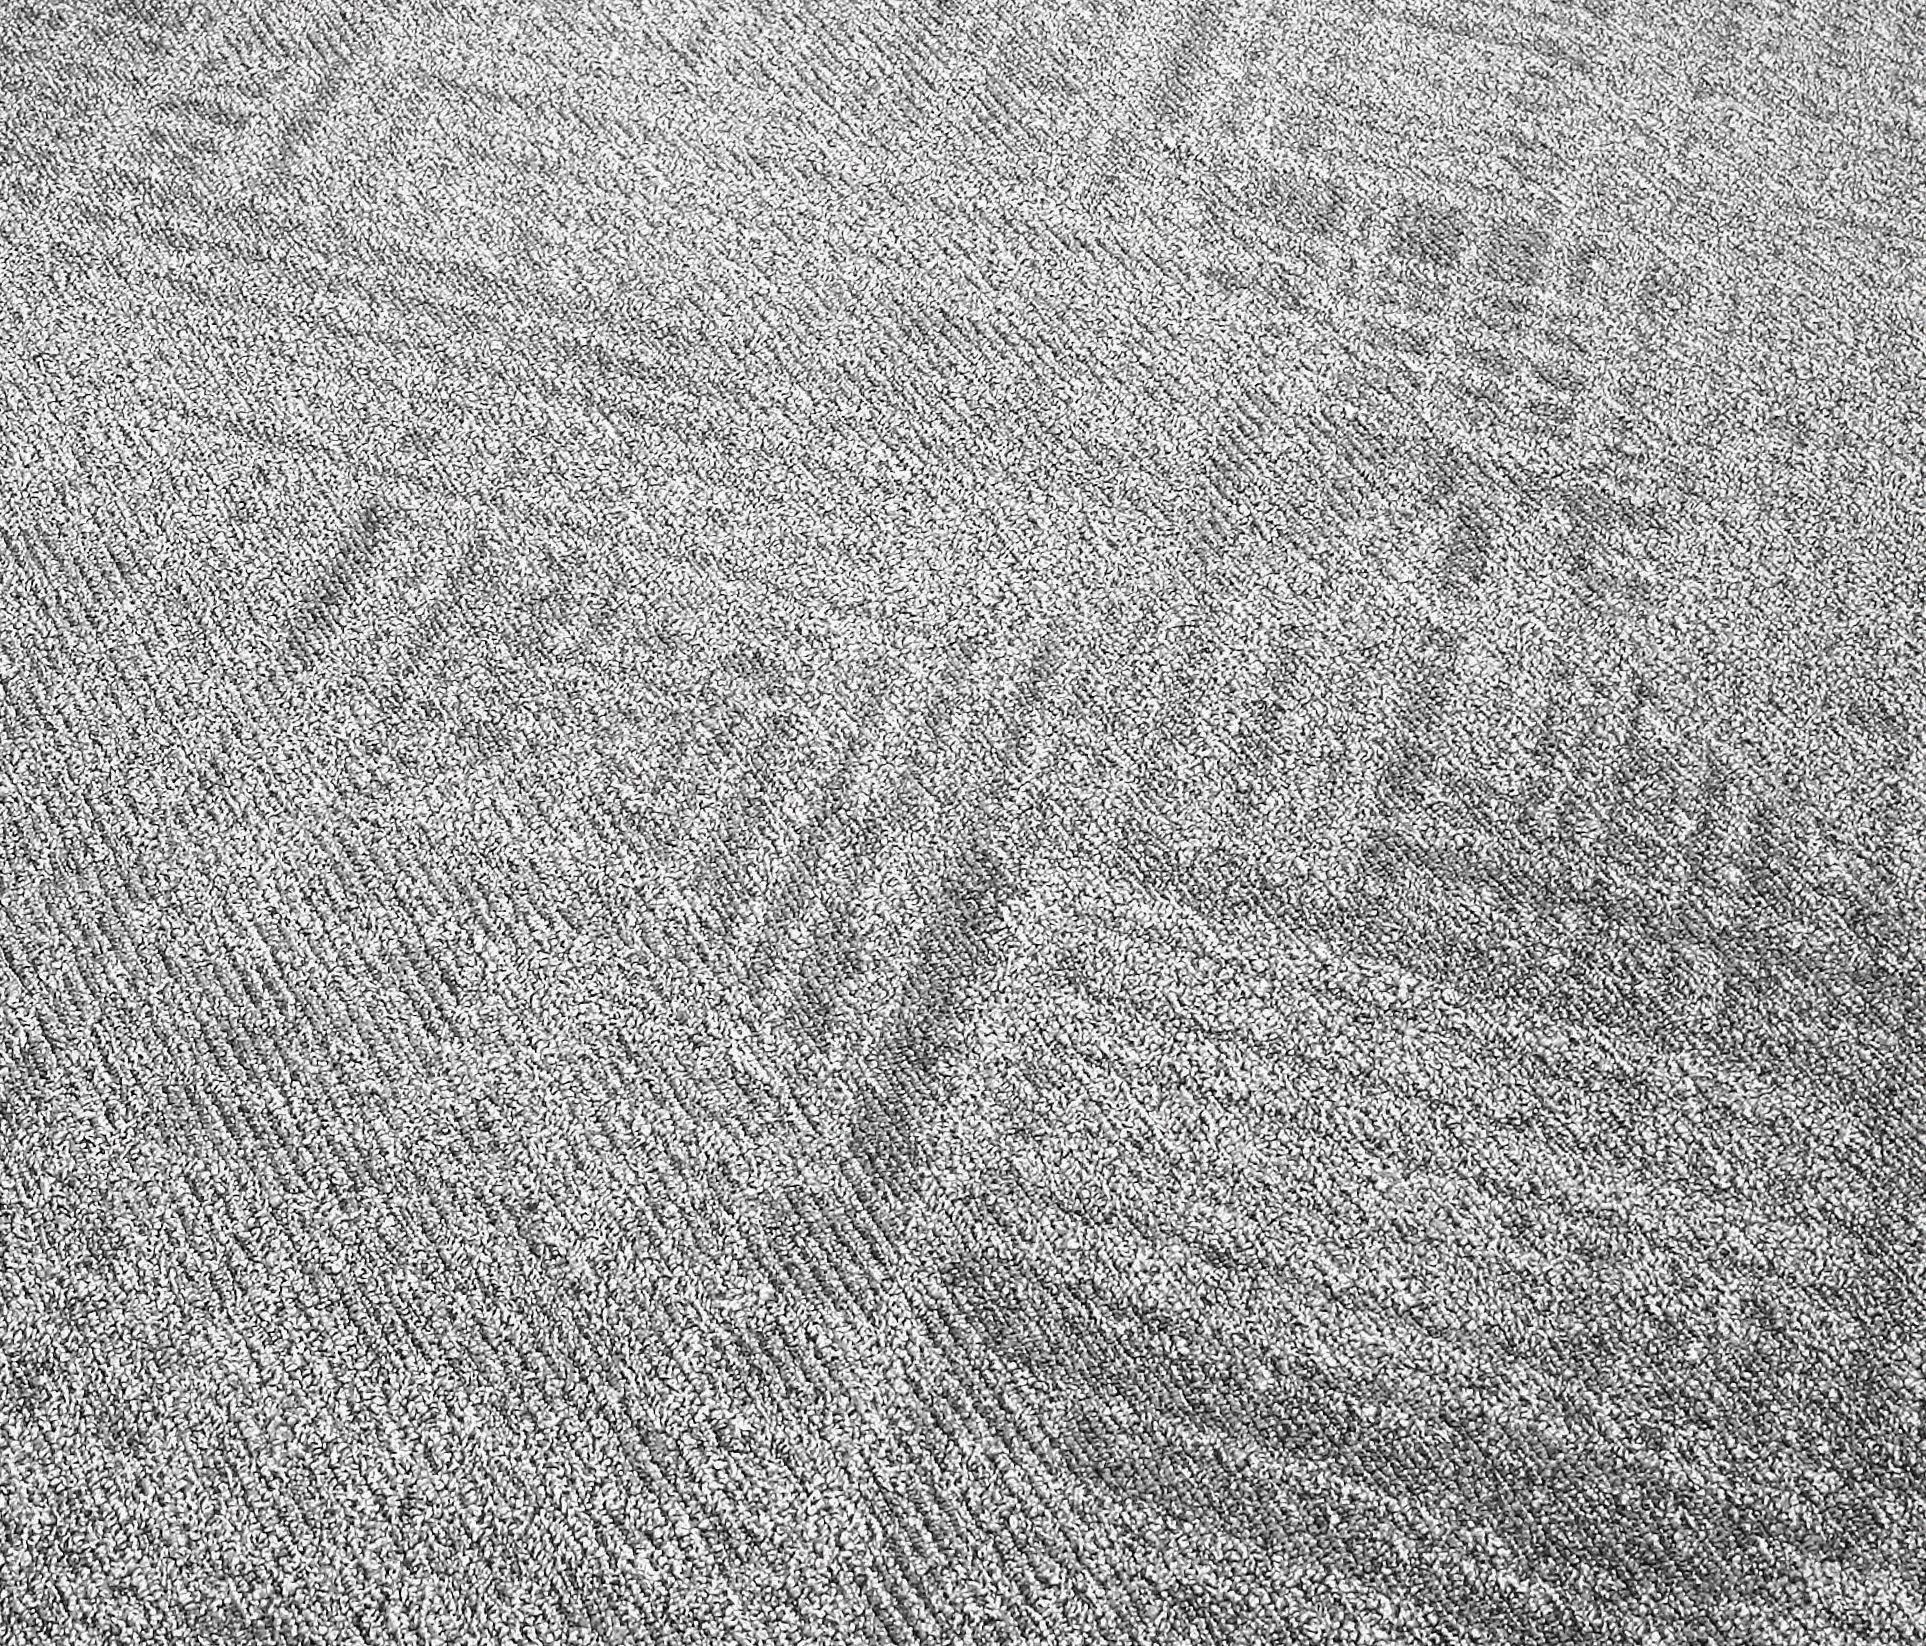 Bentley Carpet Teleport The Honoroak